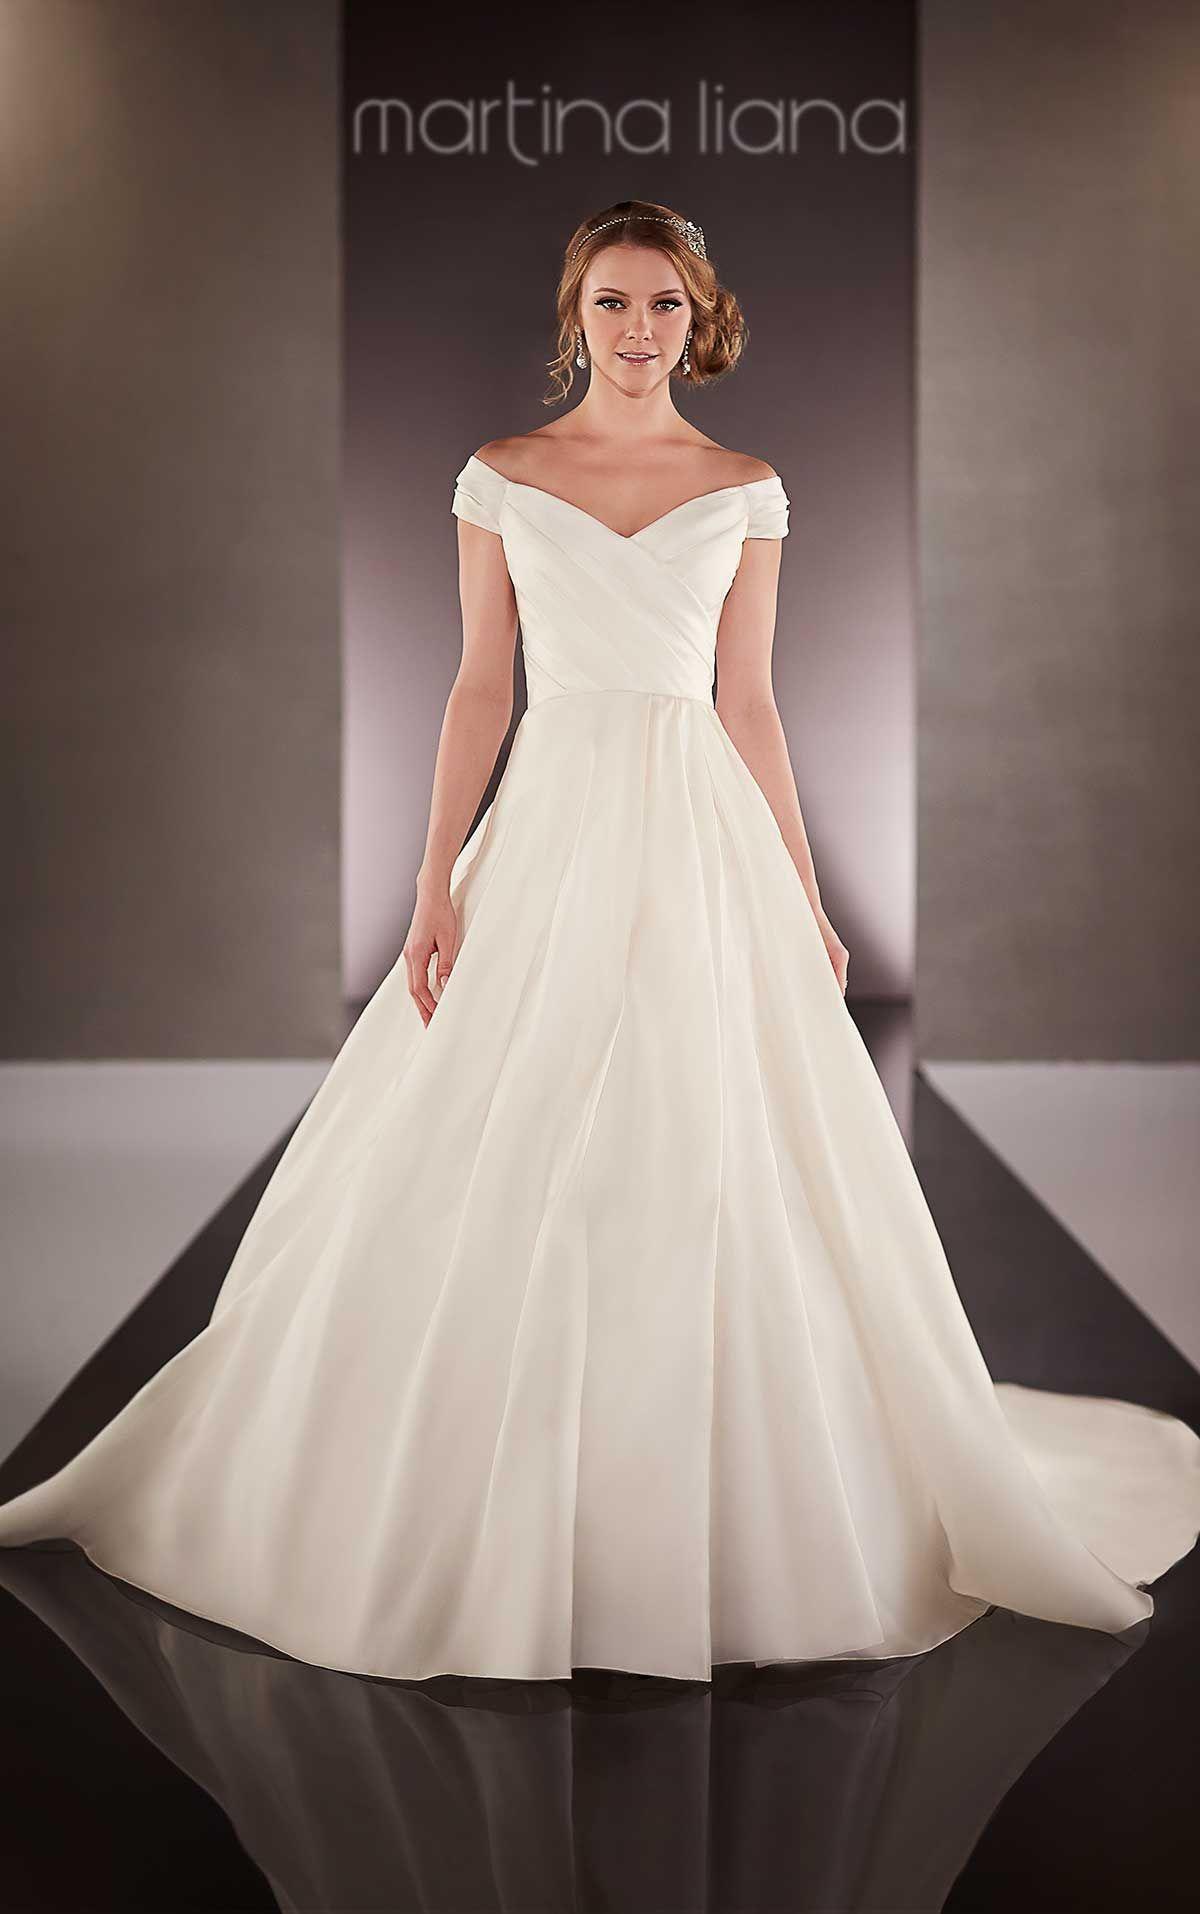 Designer Wedding Dress With Straps By Martina Liana